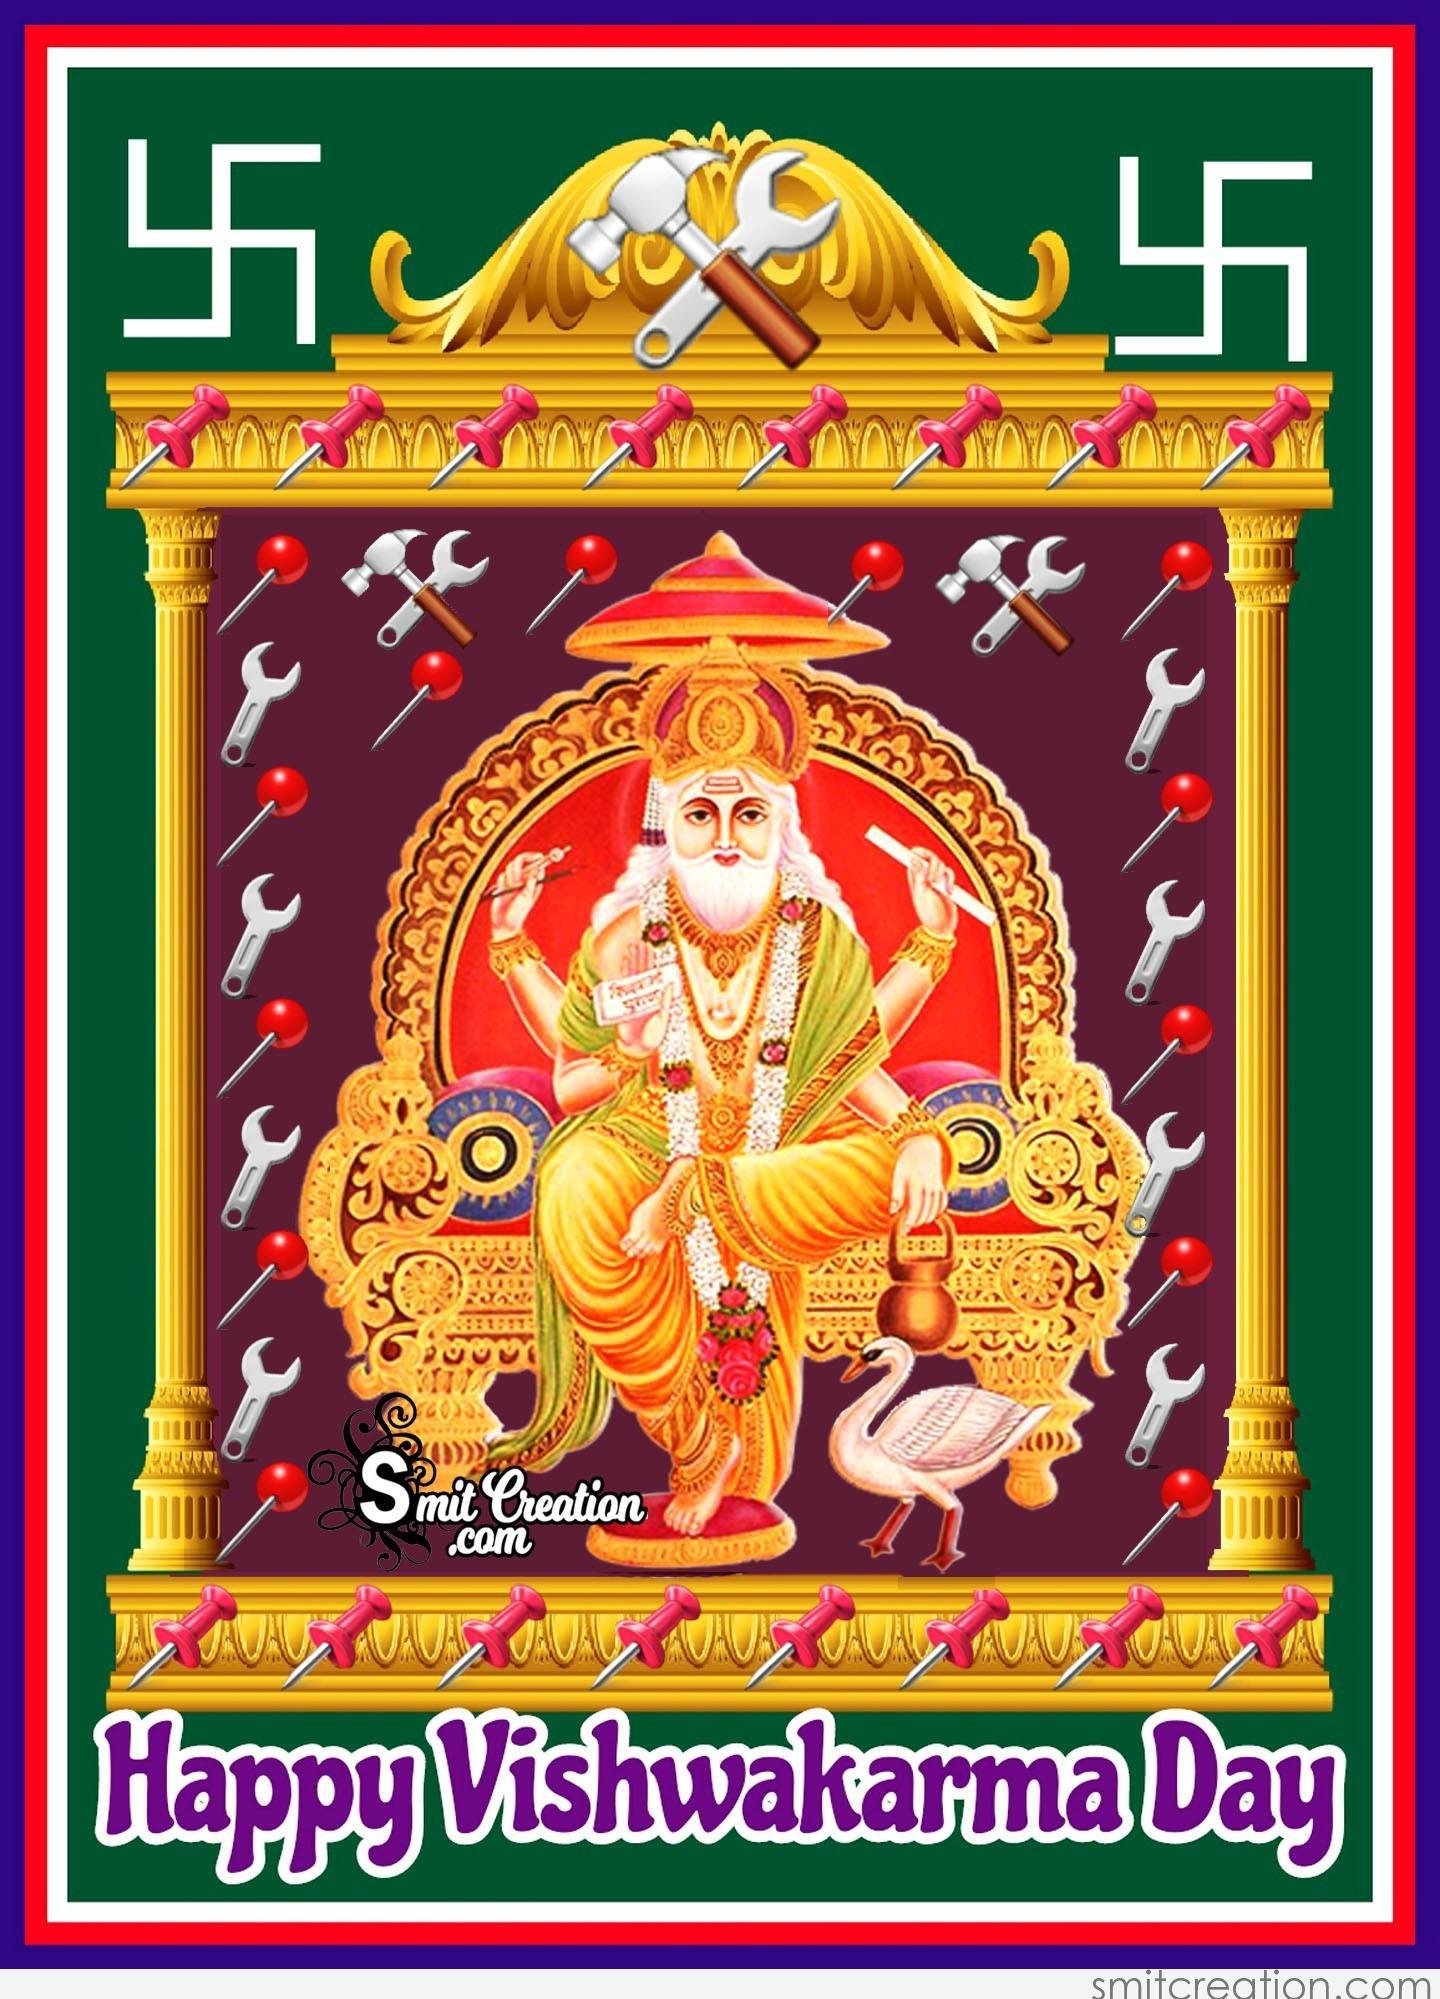 Vishwakarma Puja Pictures And Graphics Smitcreation Com